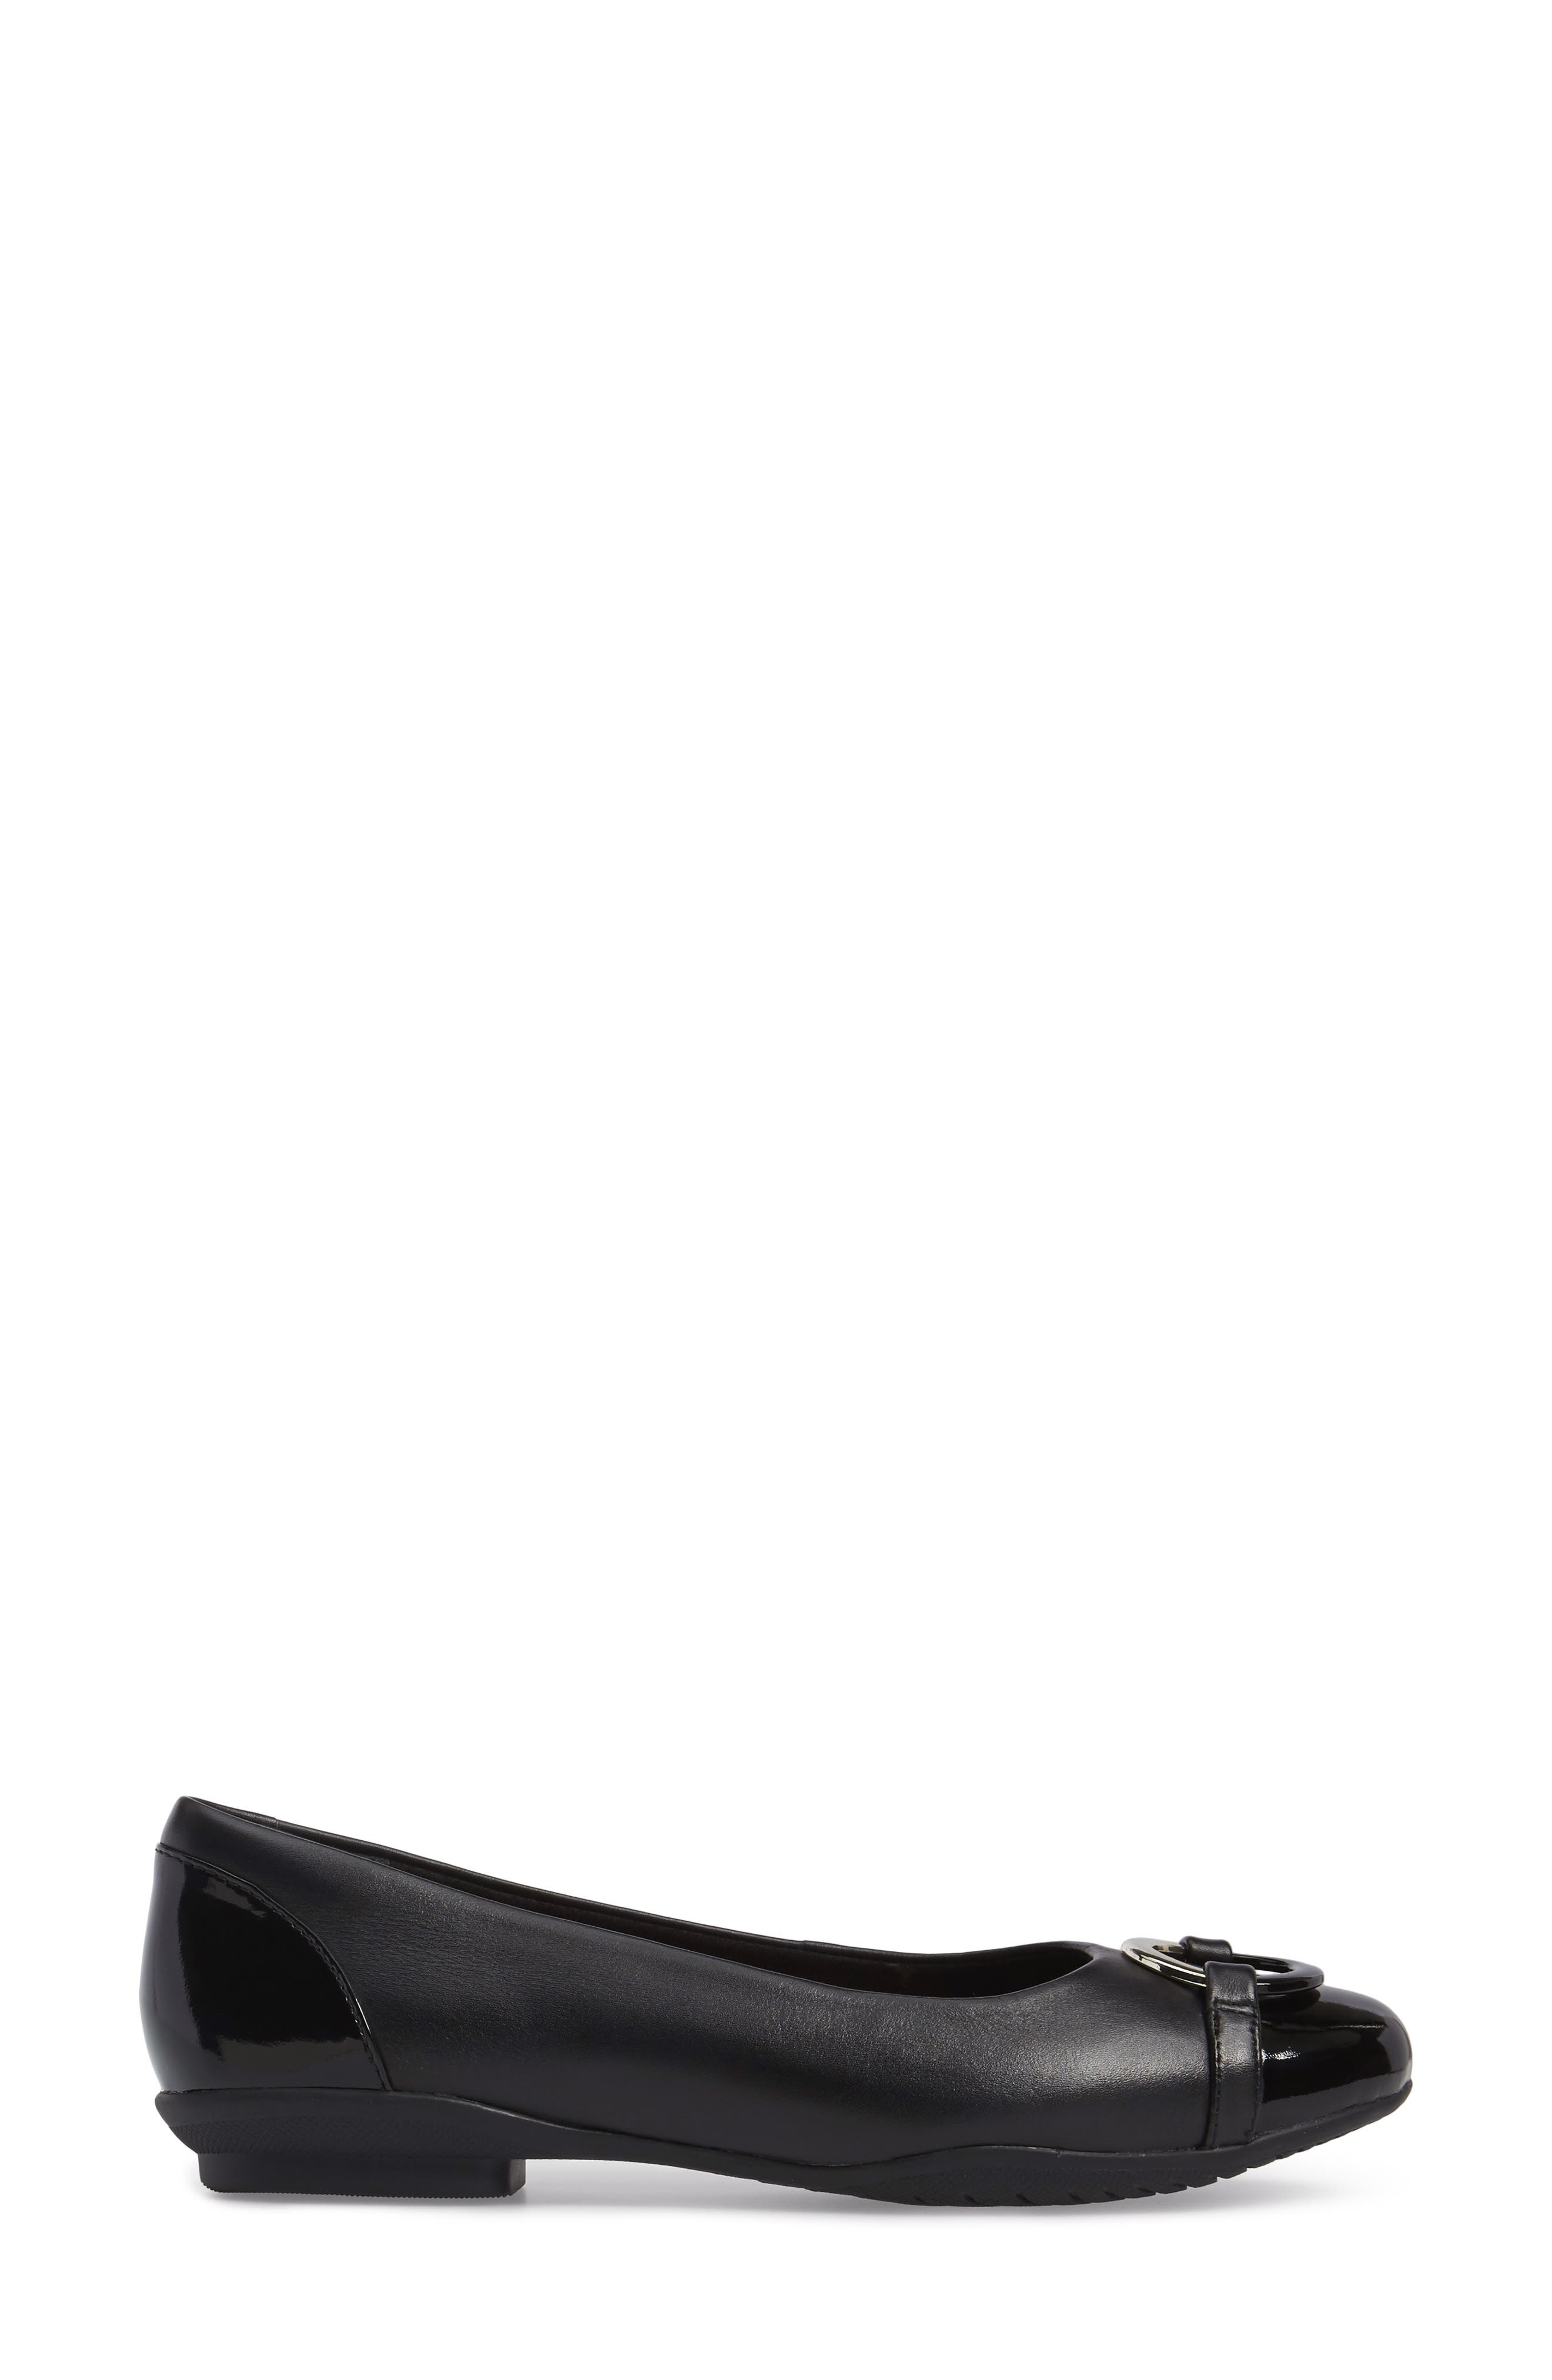 Neenah Vine Flat,                             Alternate thumbnail 3, color,                             Black Leather